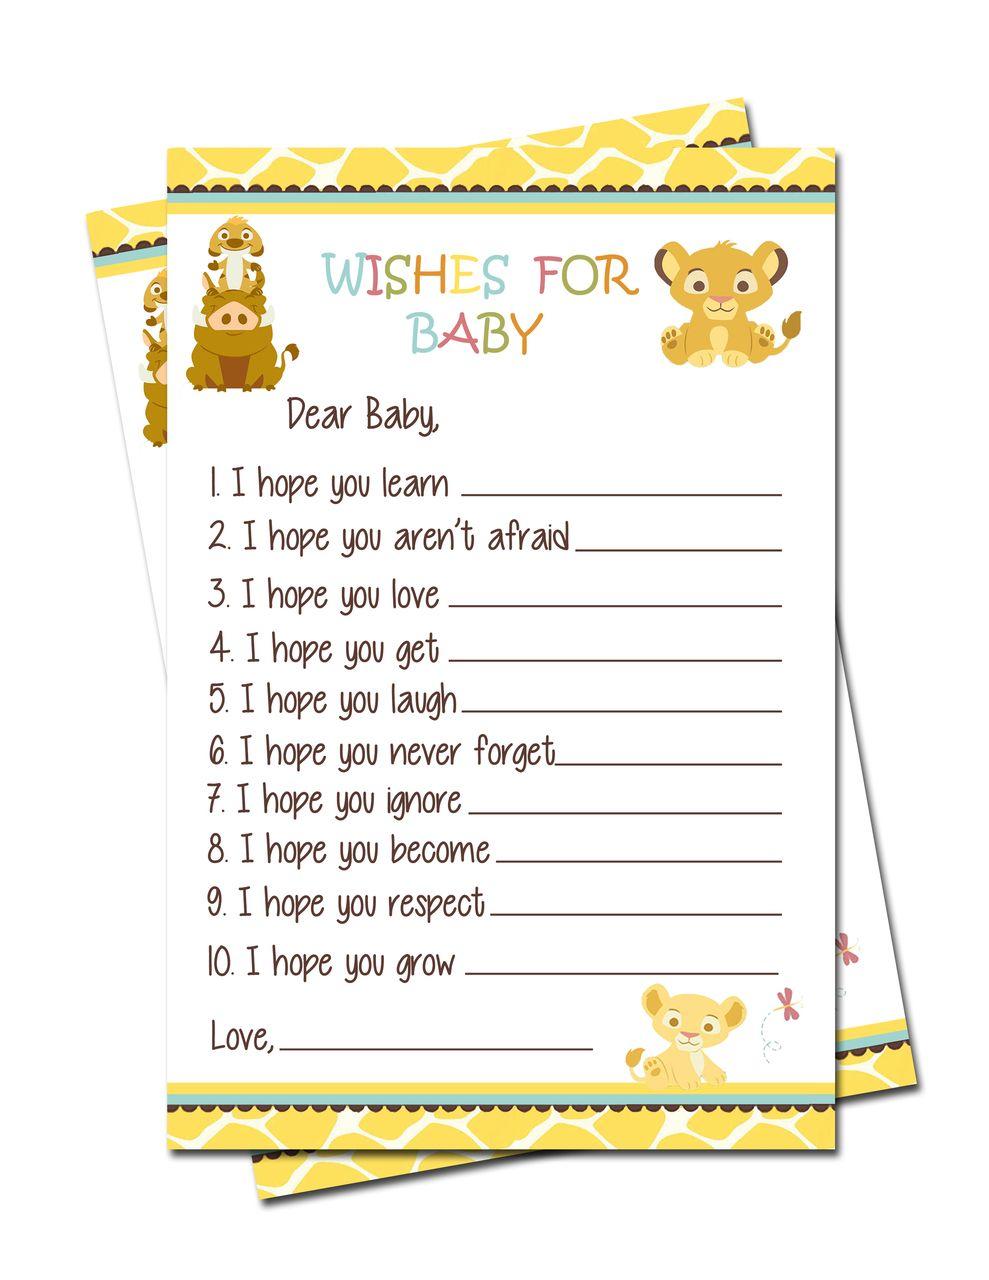 Supreme Baby Games Partyexpressinvitations Simba Lion King Baby Shower Wishes Simba Lion King Baby Shower Wishes Baby Games Lion King Baby Baby Shower Wishes Christian Baby Shower Wishes Template